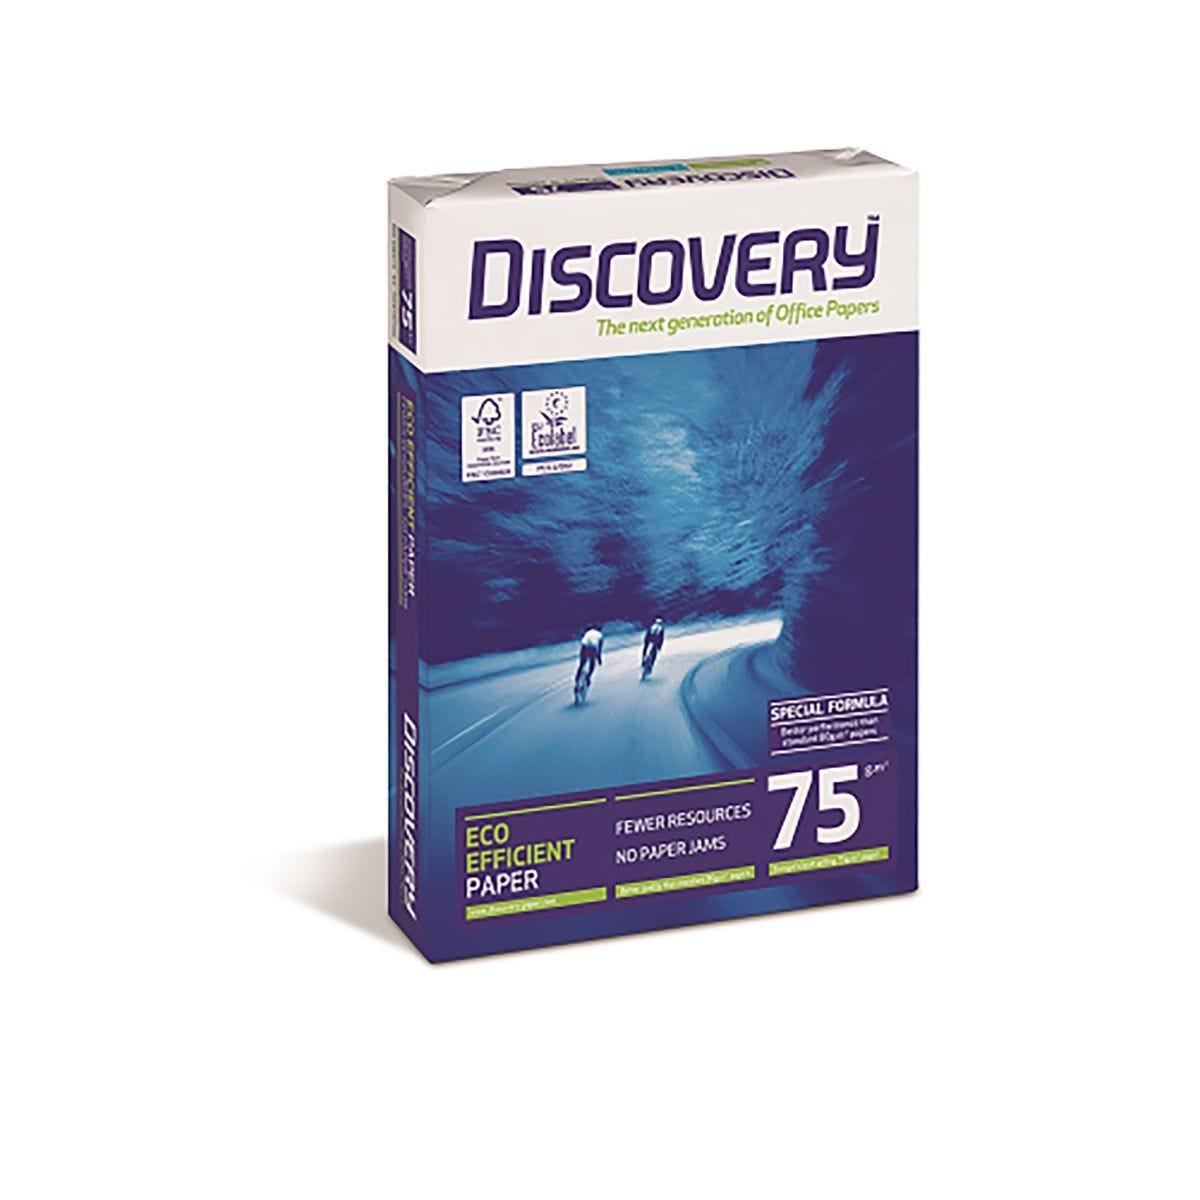 Discovery Copier A4 75gsm Ream Box 5